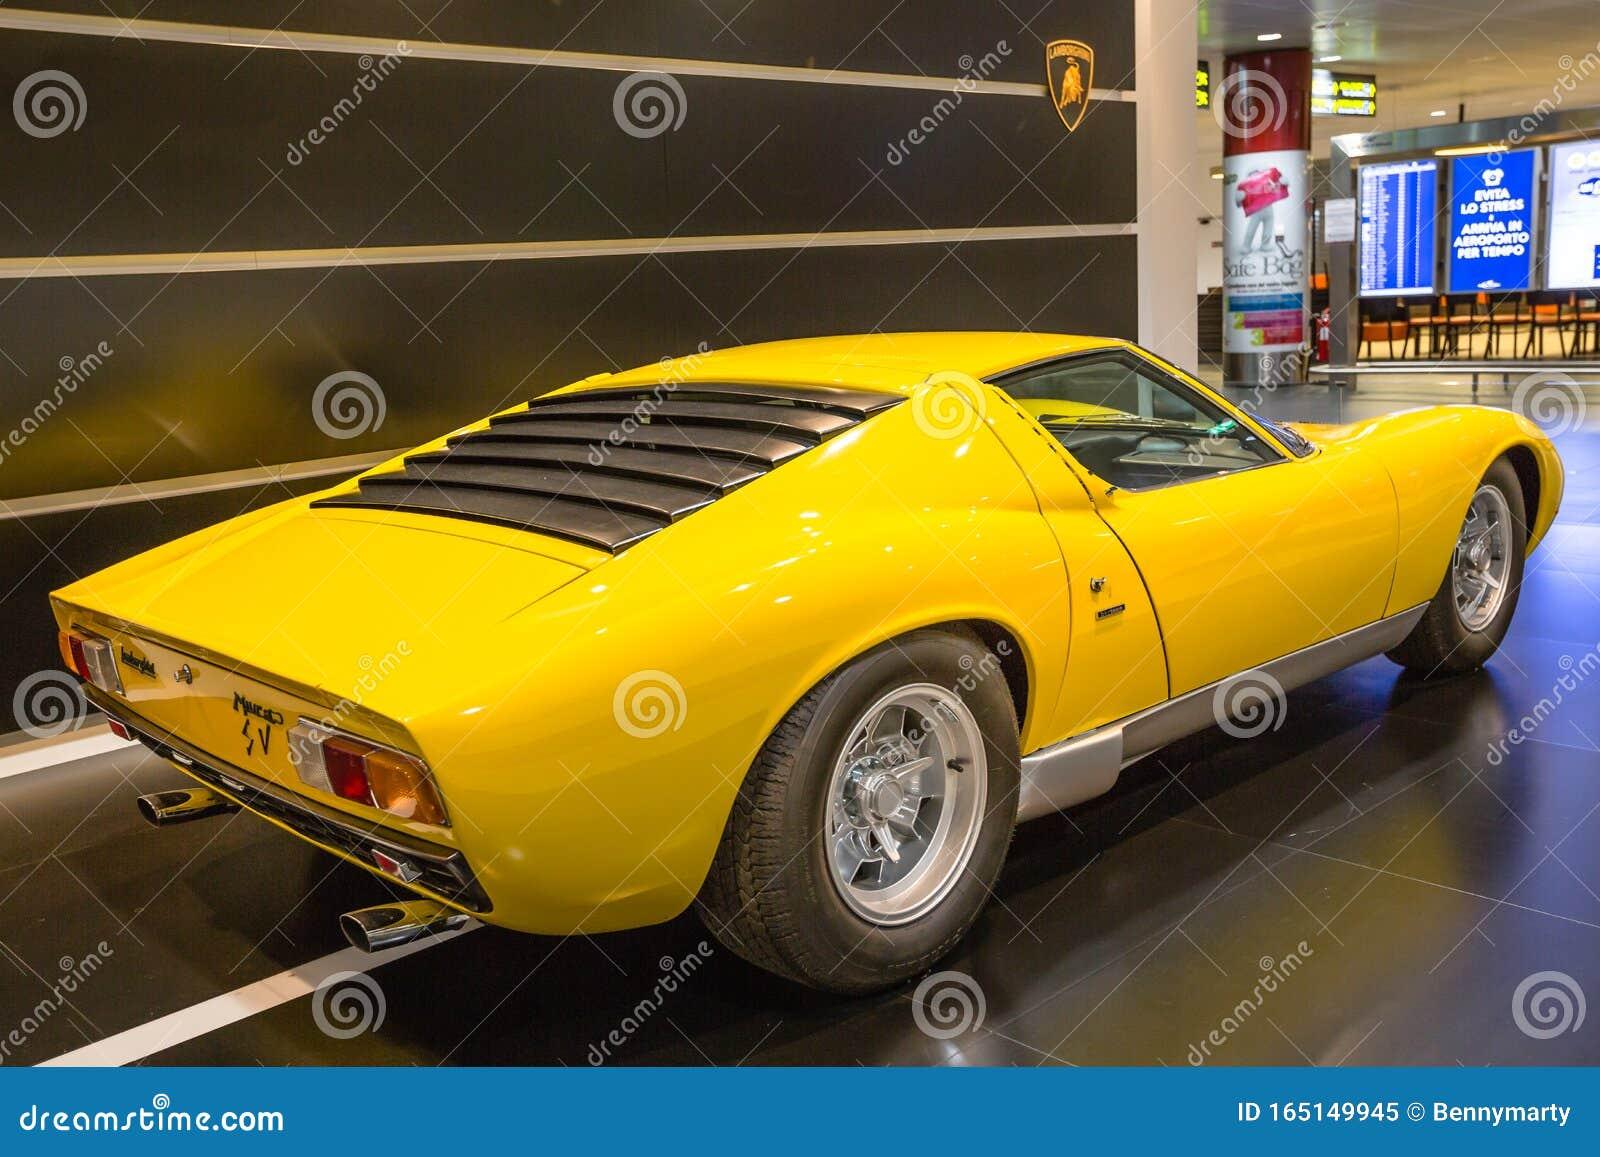 Vintage Lamborghini Miura Car Editorial Image Image Of Automotive Motor 165149945